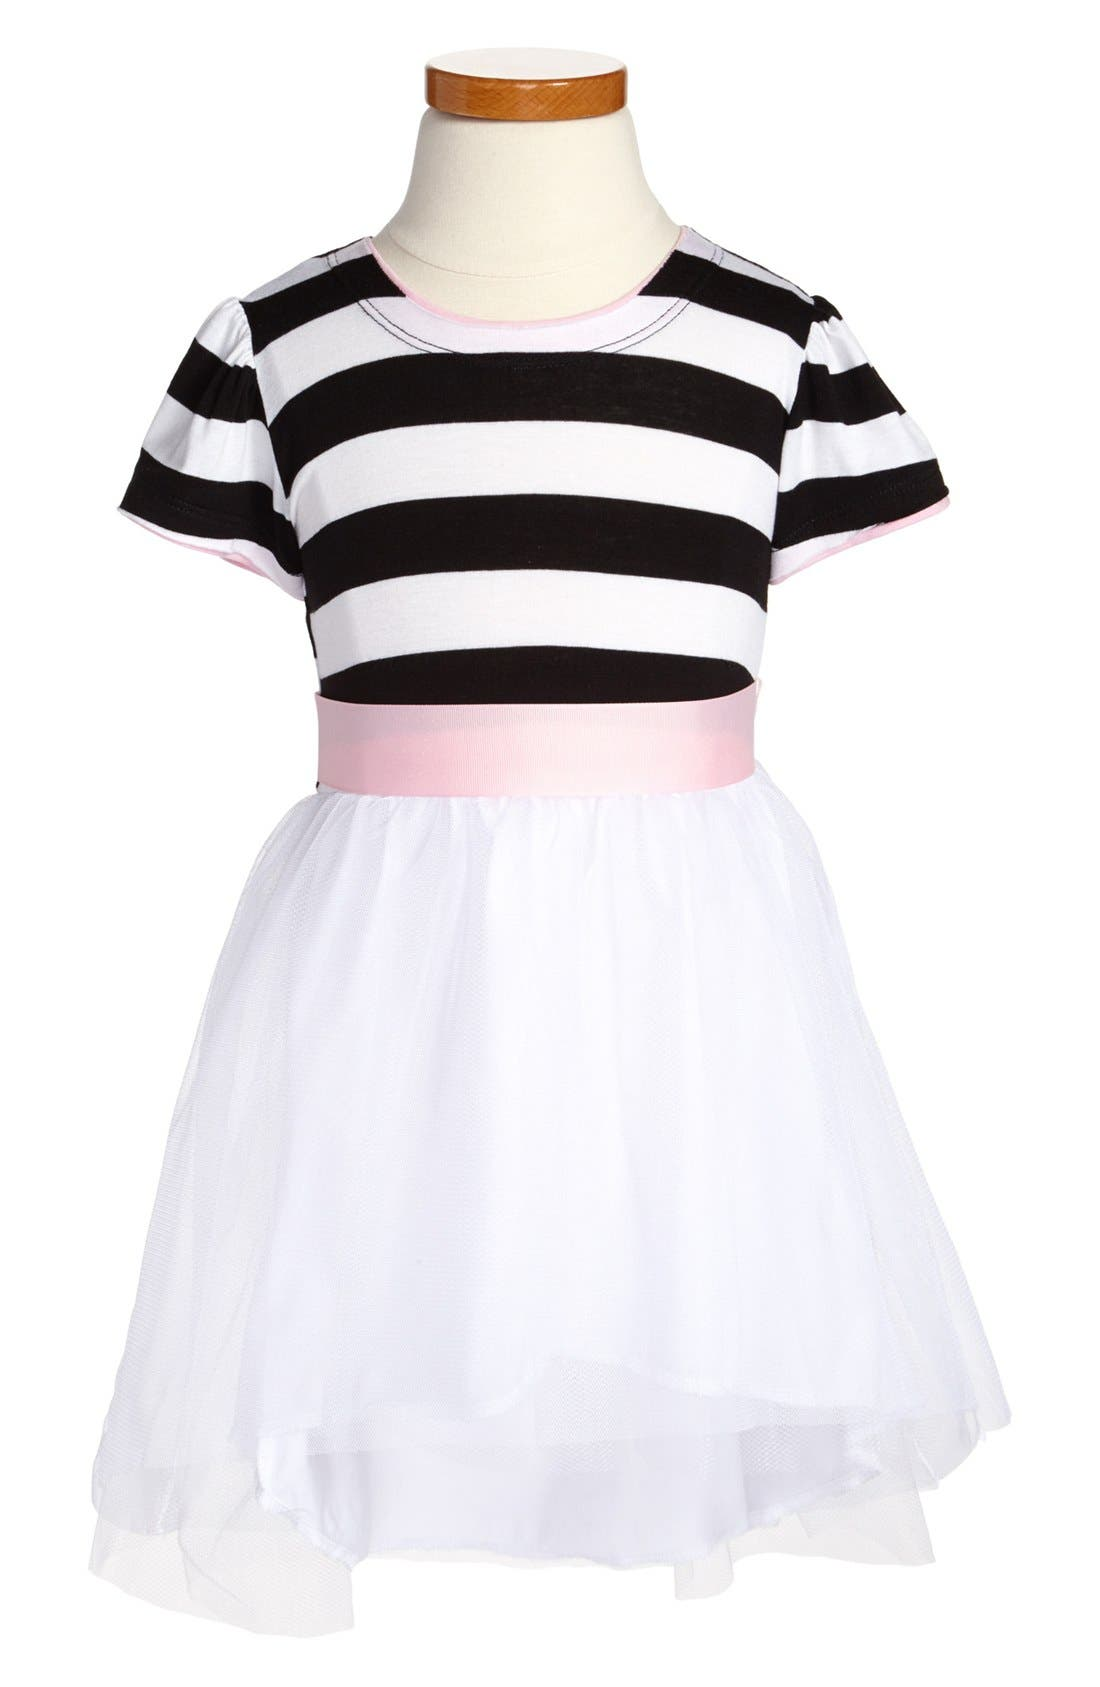 Main Image - Twirls & Twigs Stripe Bodice Dress (Little Girls & Big Girls)